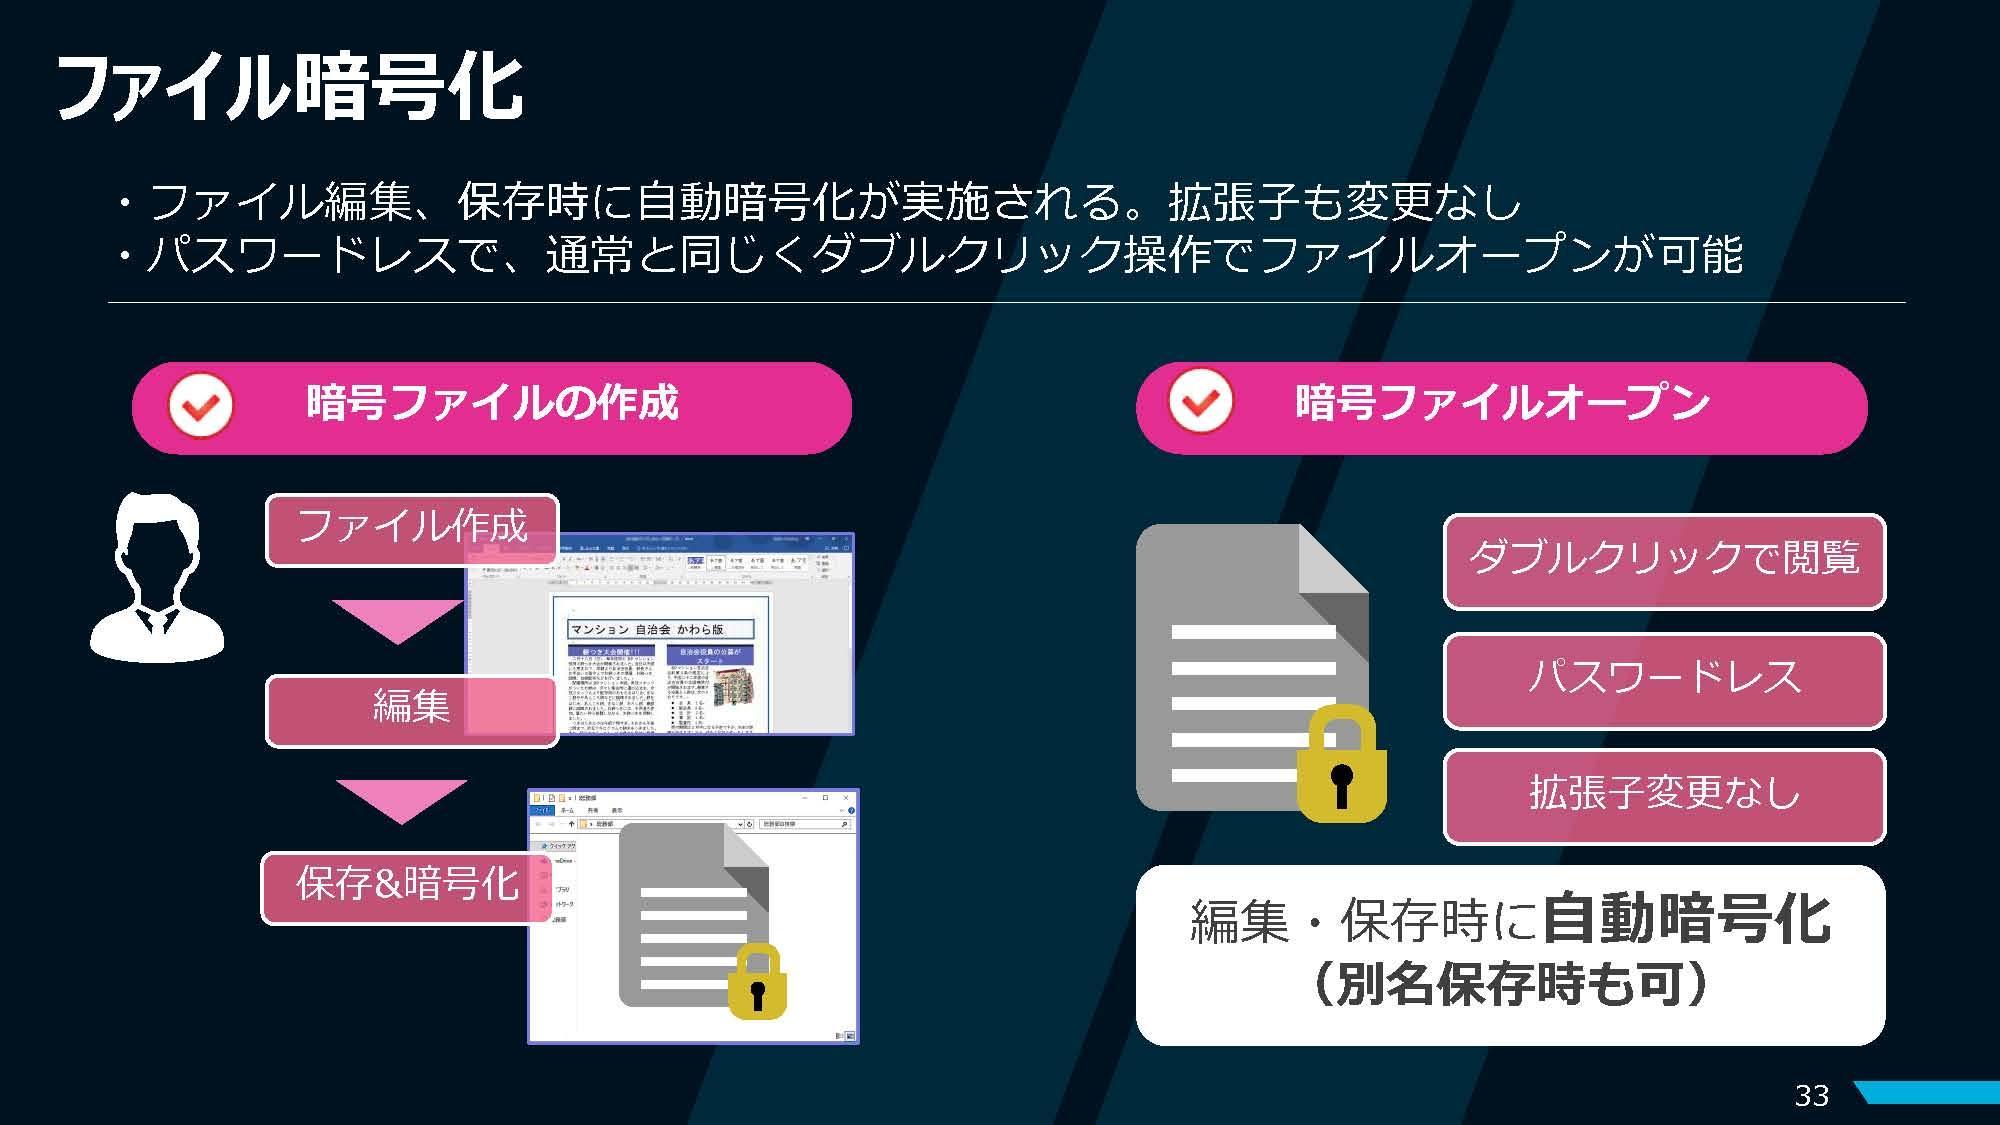 C:\Users\lma-Five\Desktop\オーバル セミレポ\採用画像jpg\6-33.jpg